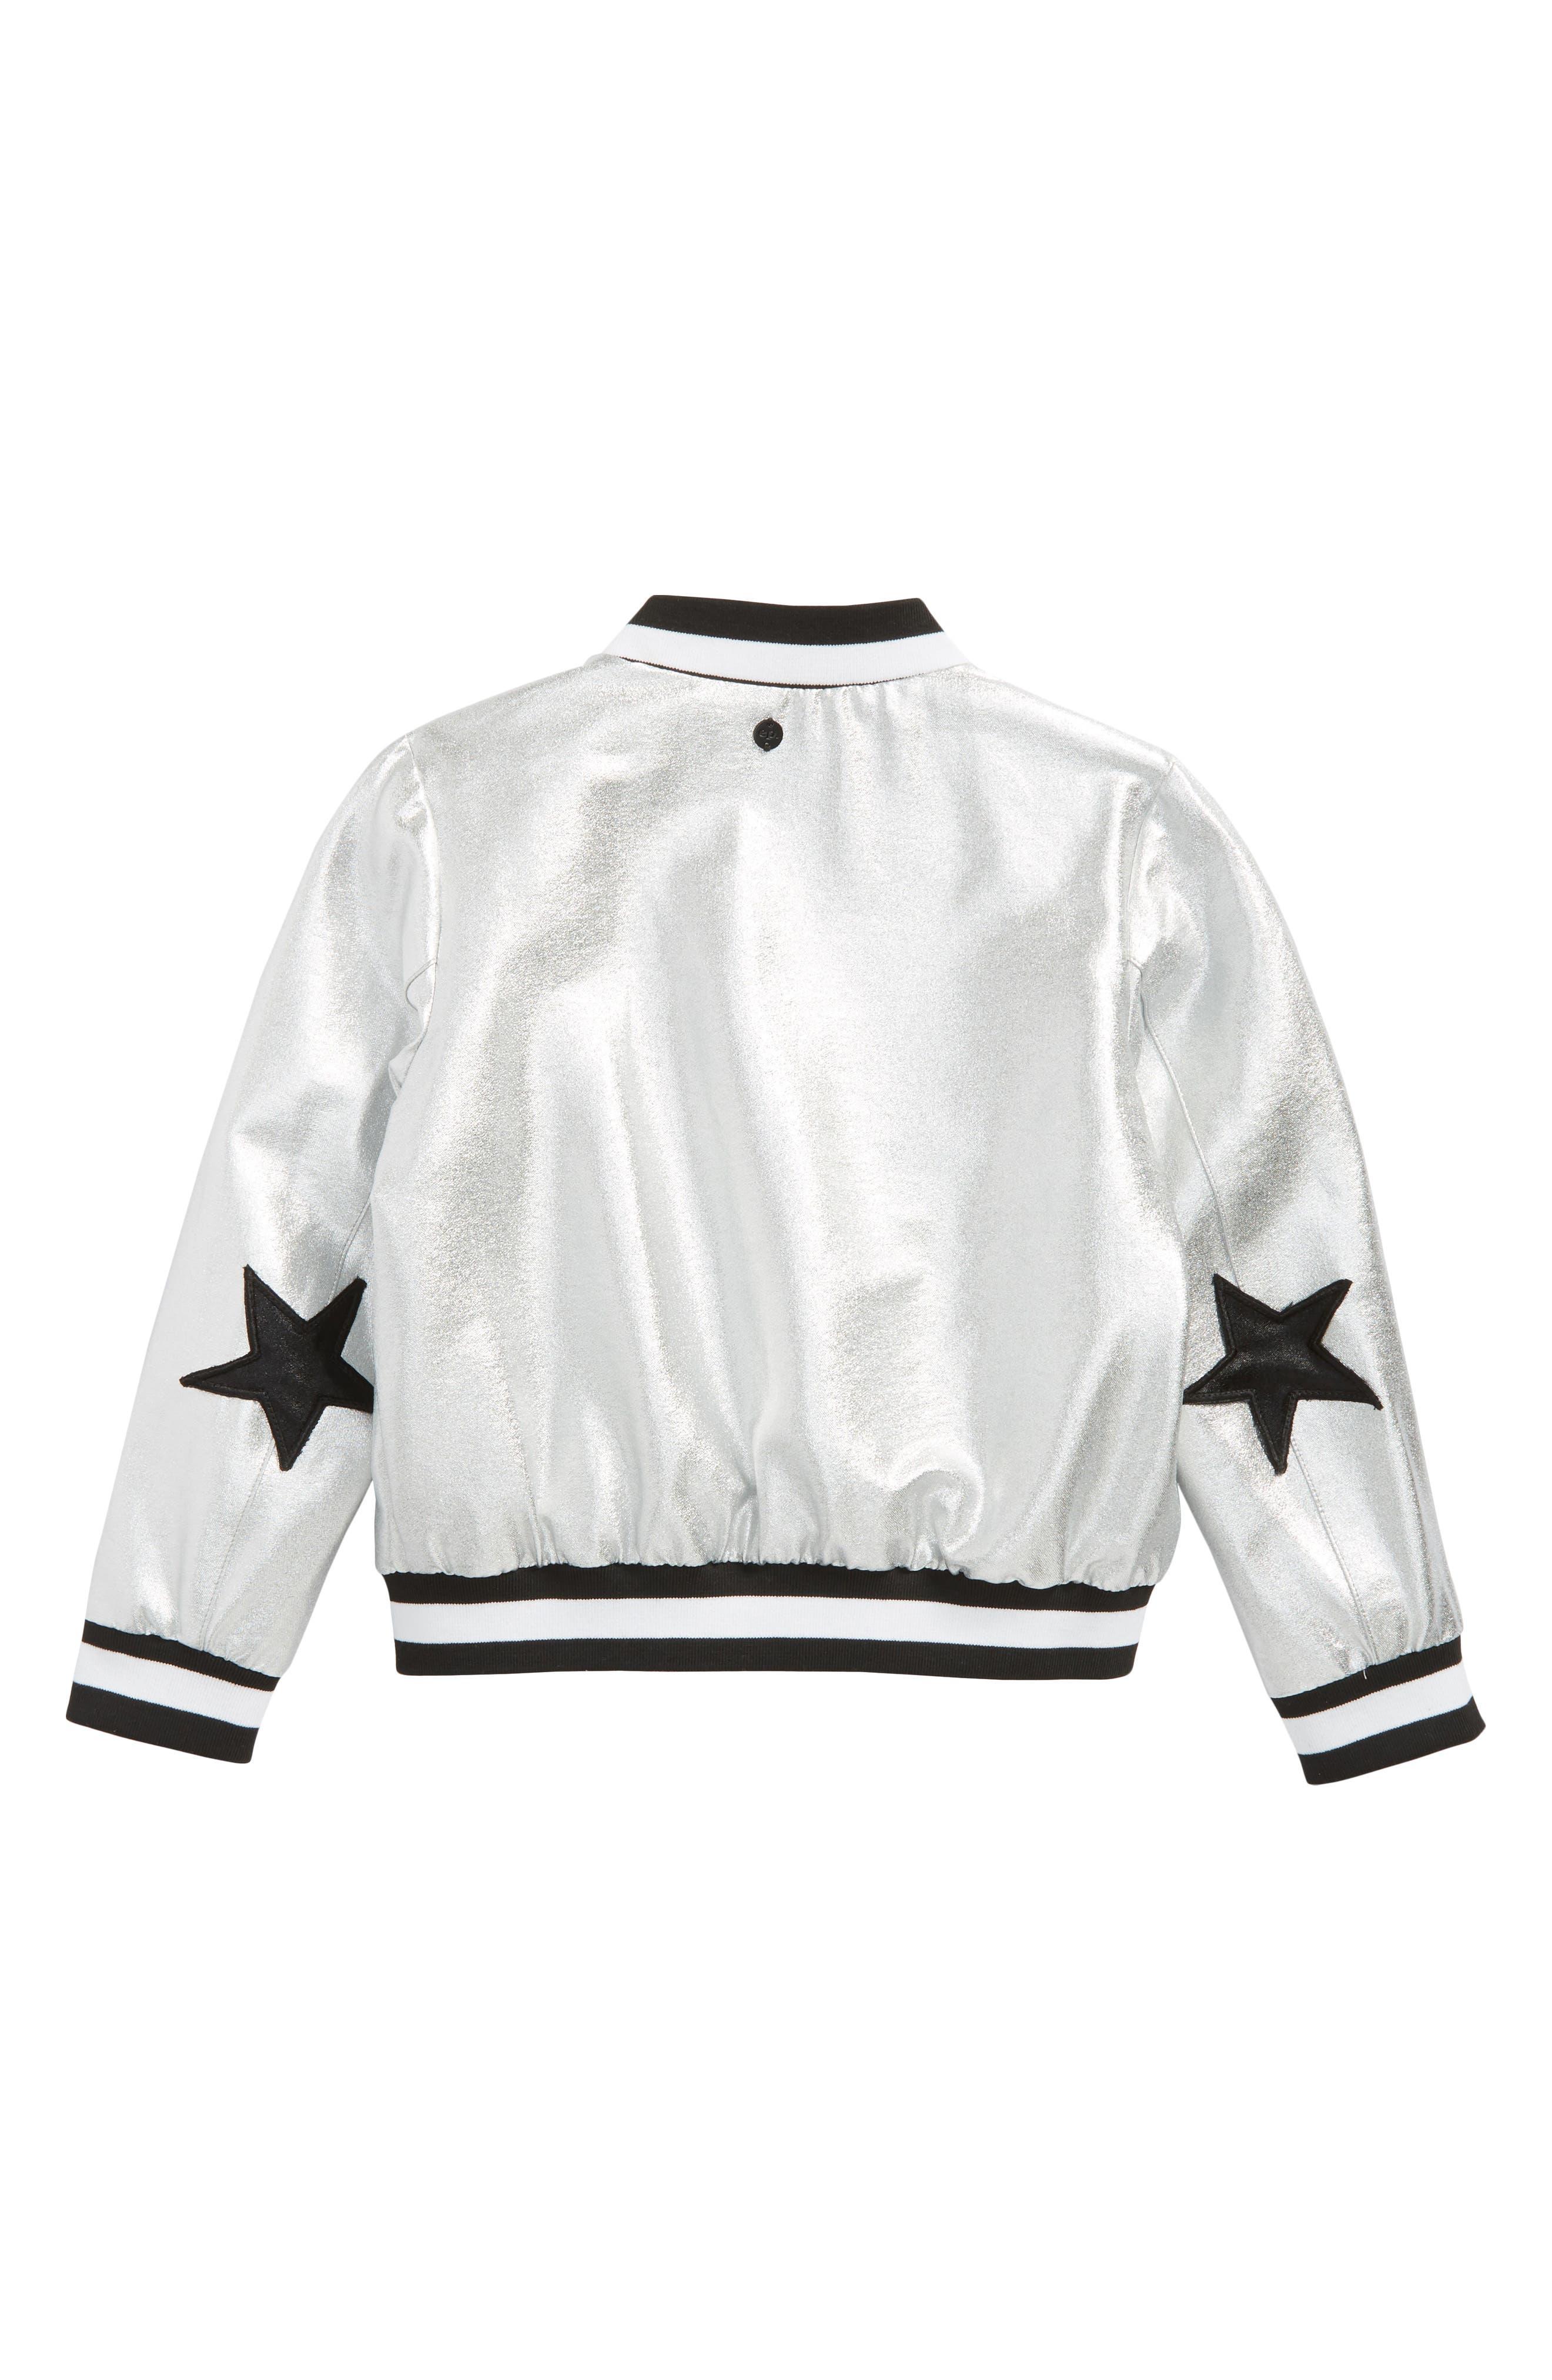 Aliver Star Bomber Jacket,                             Alternate thumbnail 2, color,                             040